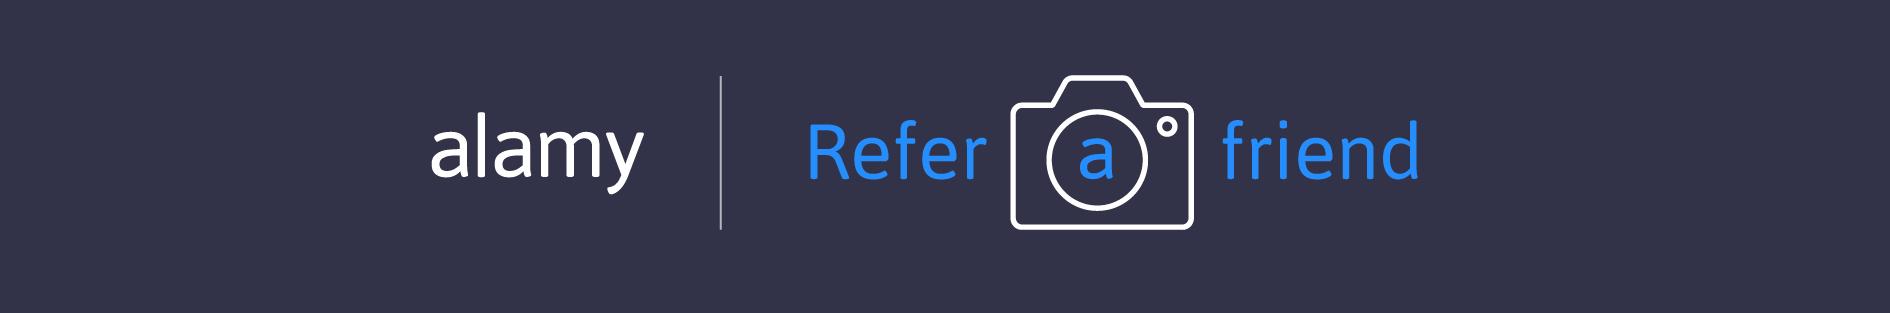 Alamy Referral Program